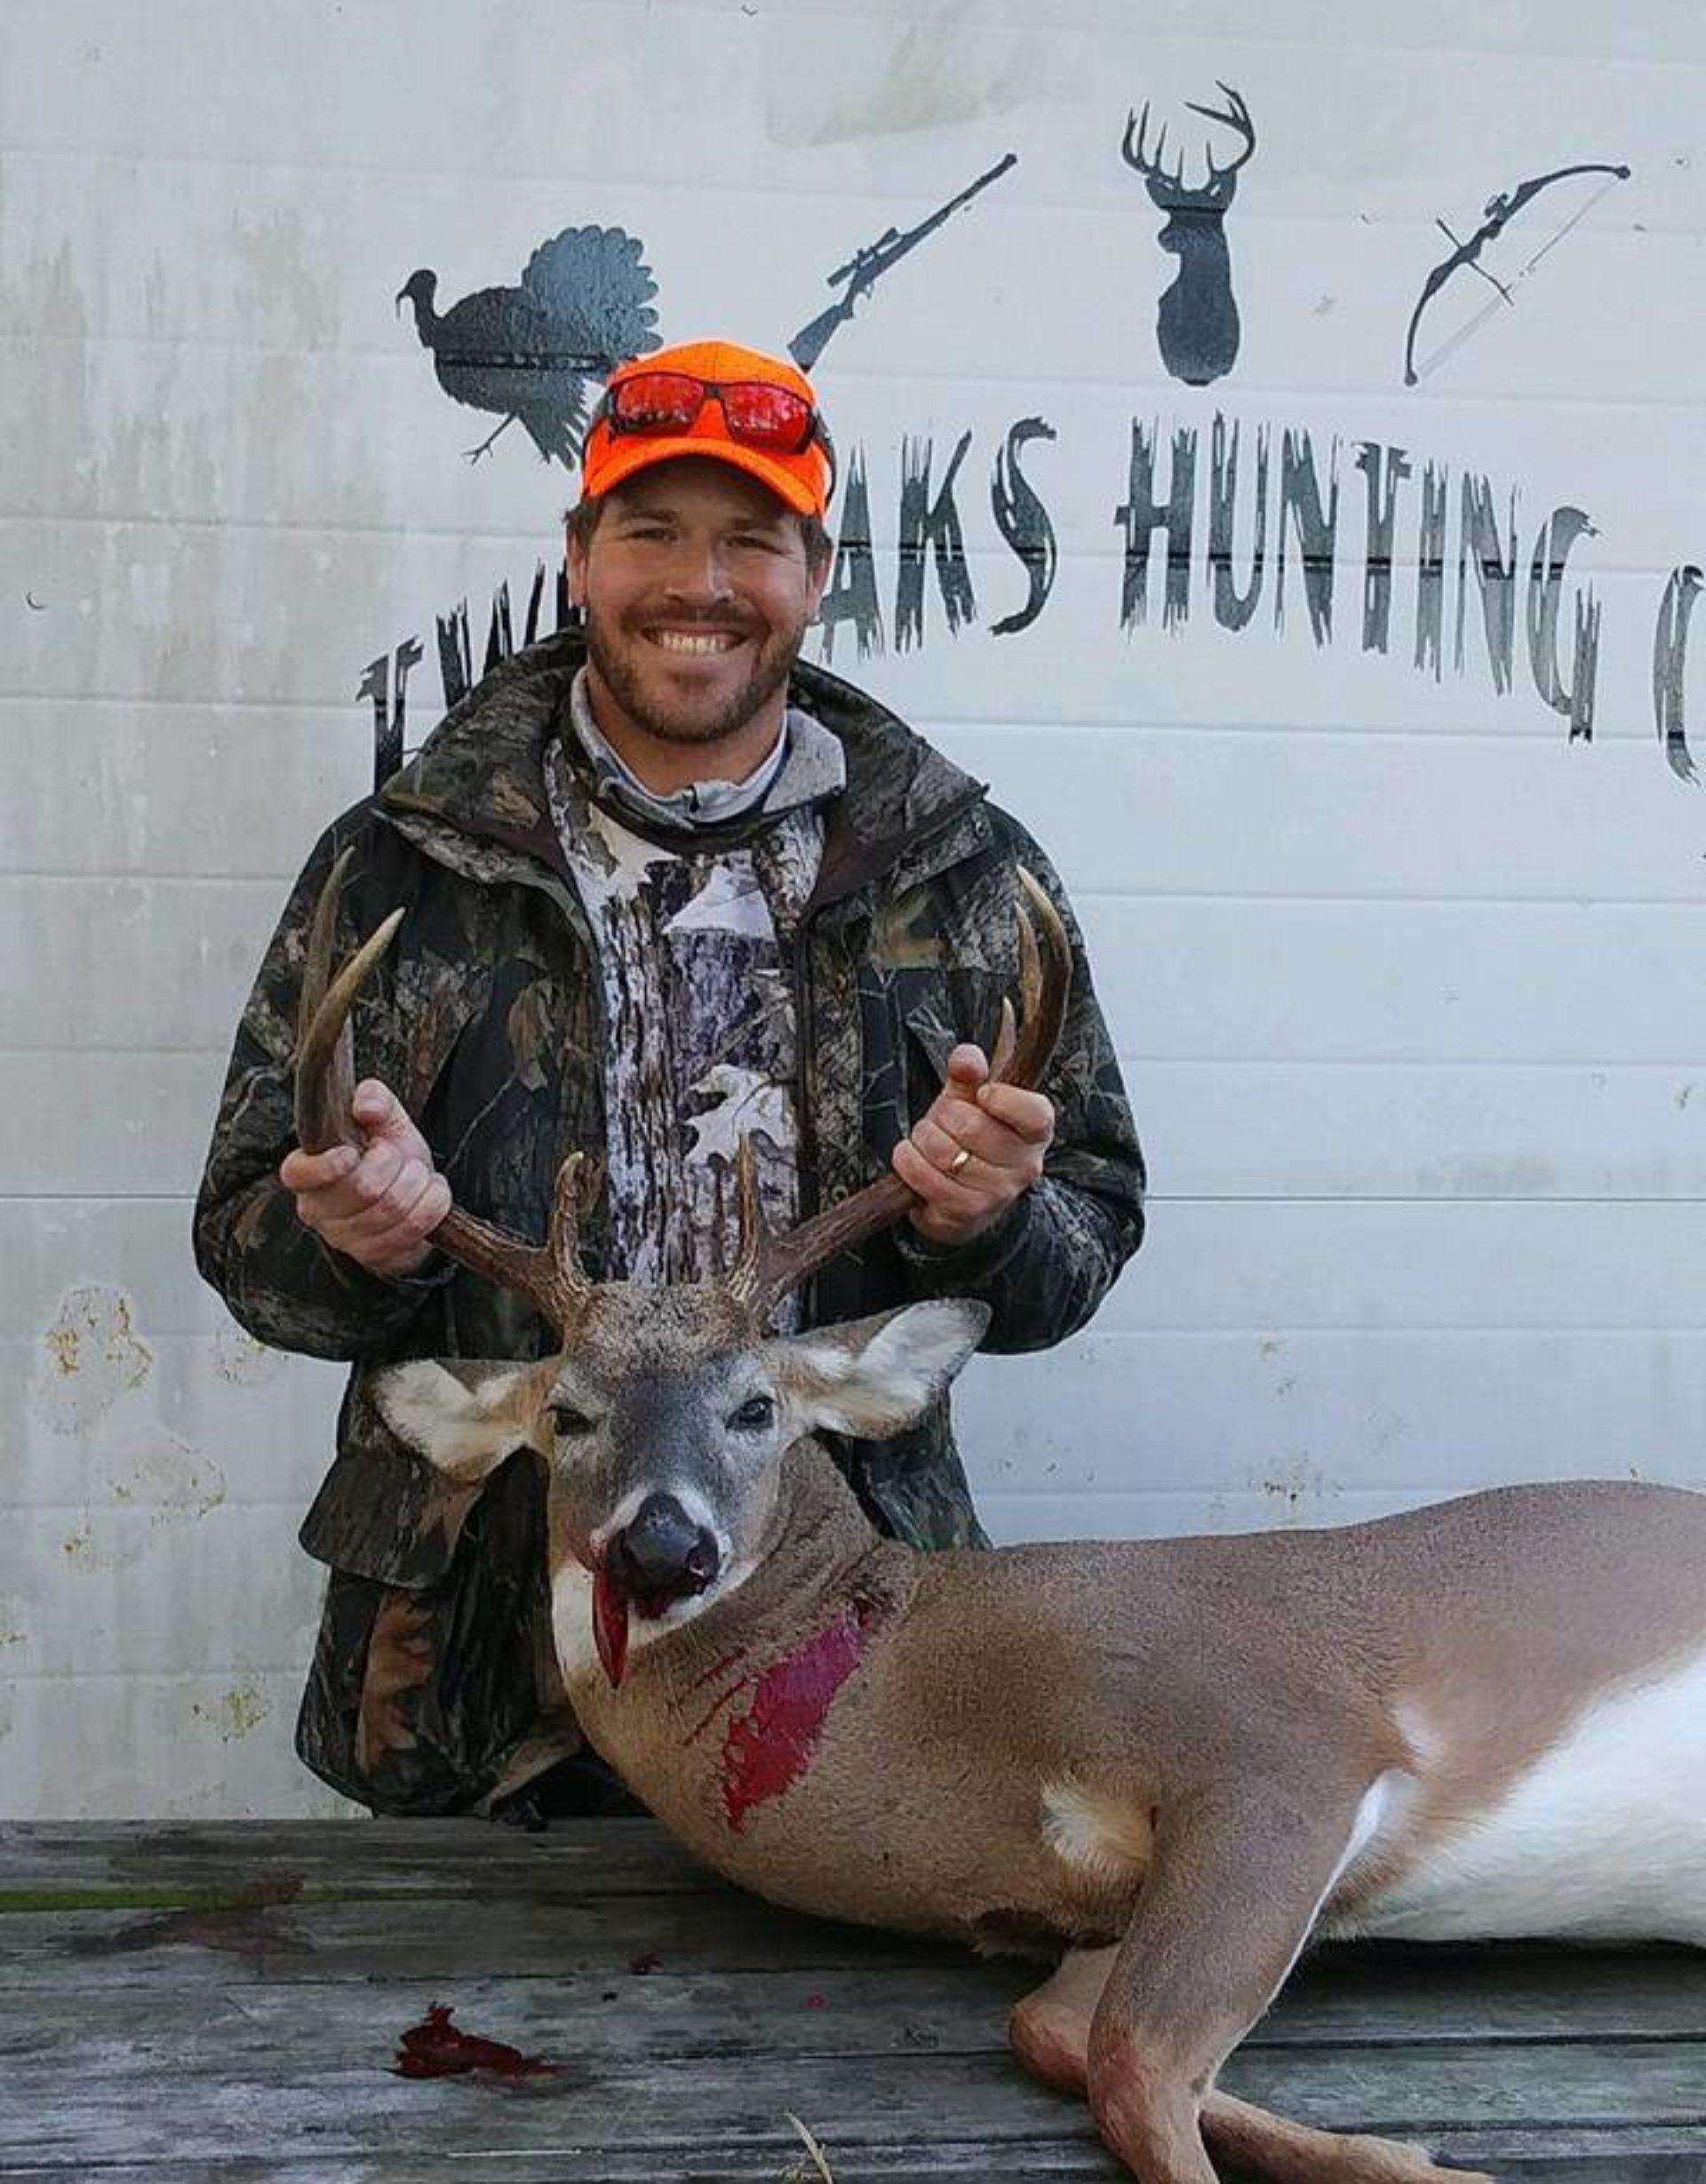 Twin Oaks Hunting Club